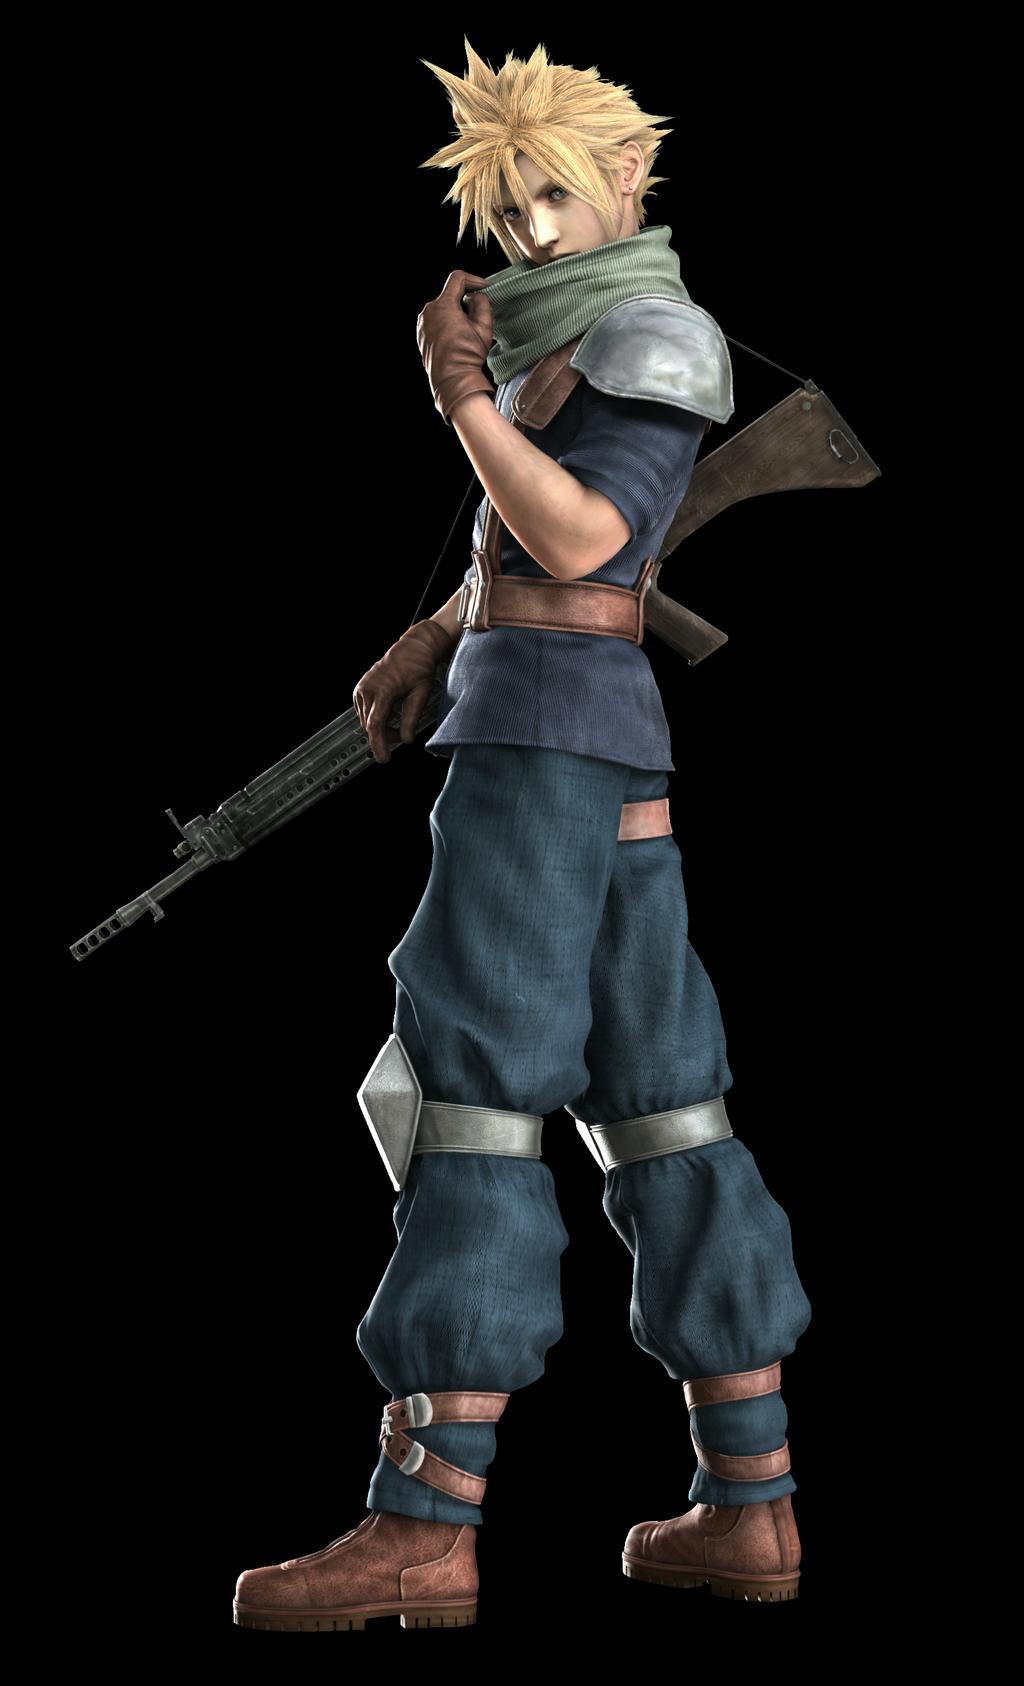 Crisis Core -Final Fantasy VII-/Drake/Part 6